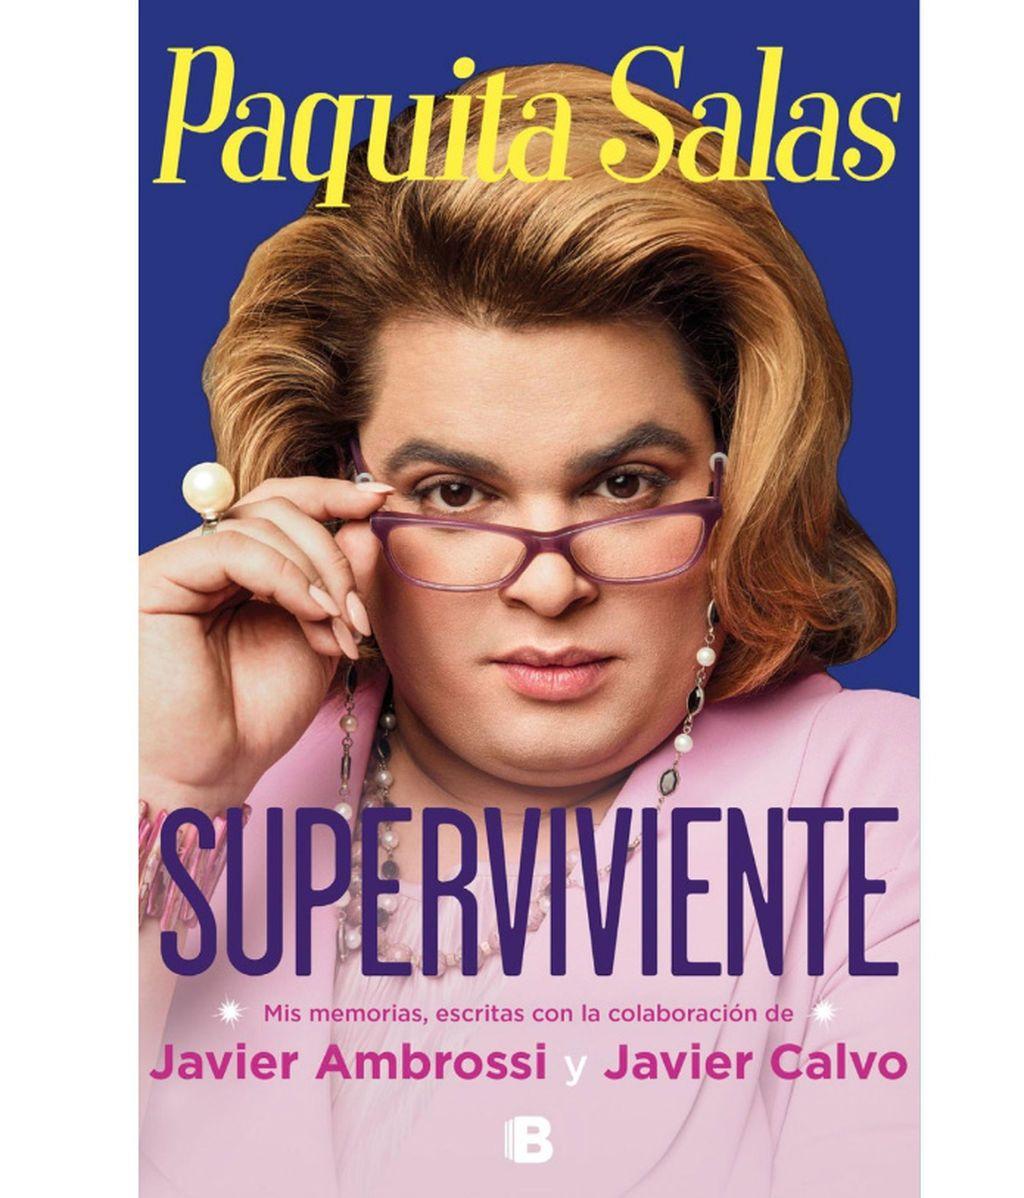 'Supervivientes', las memorias de Paquita Salas